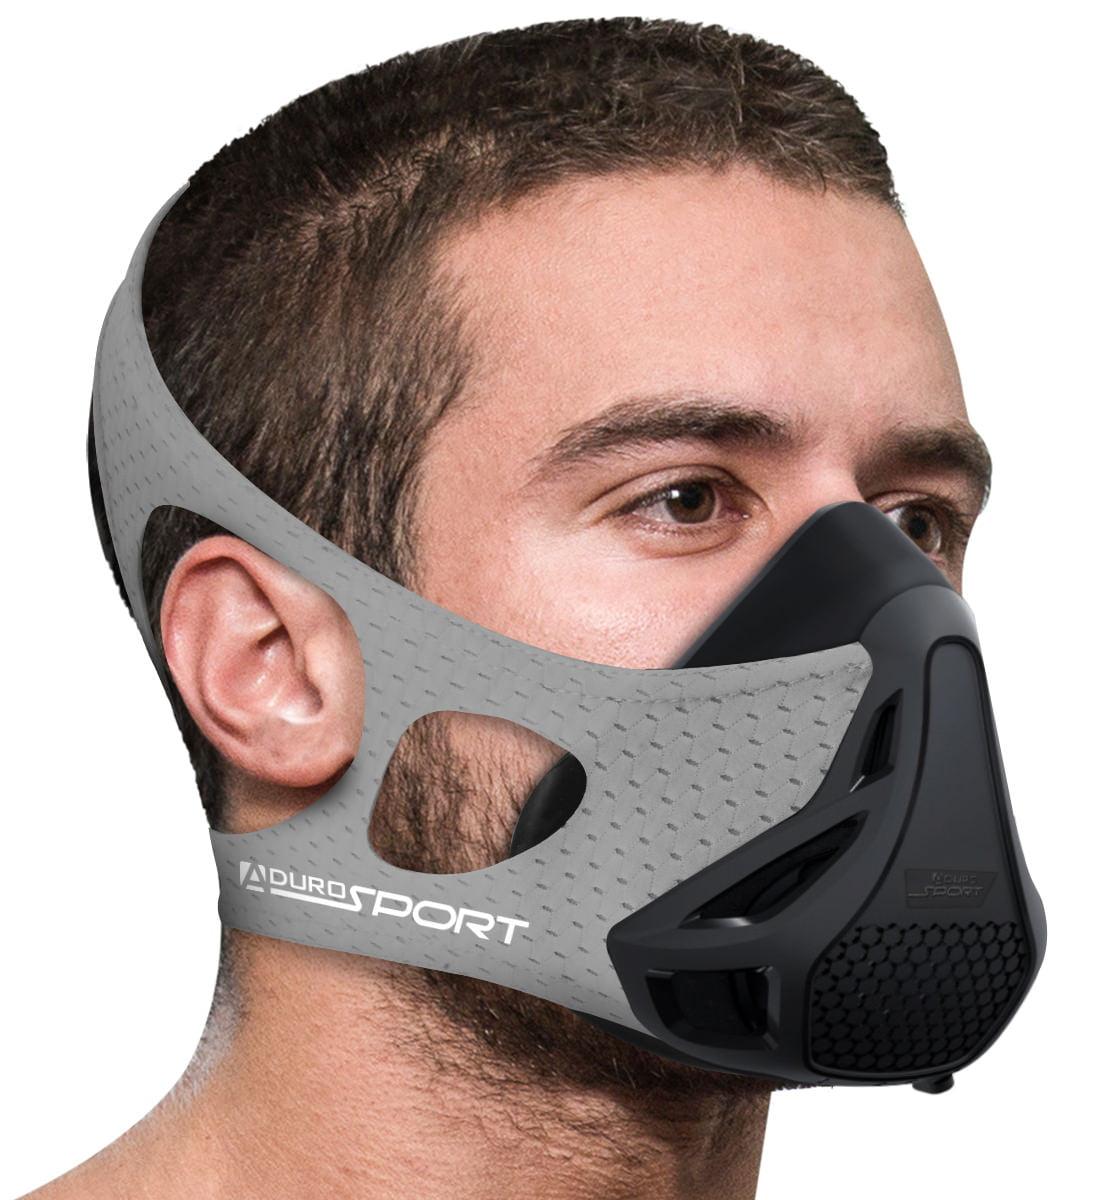 Peak Resistance High Altitude Training Mask by Aduro Sport